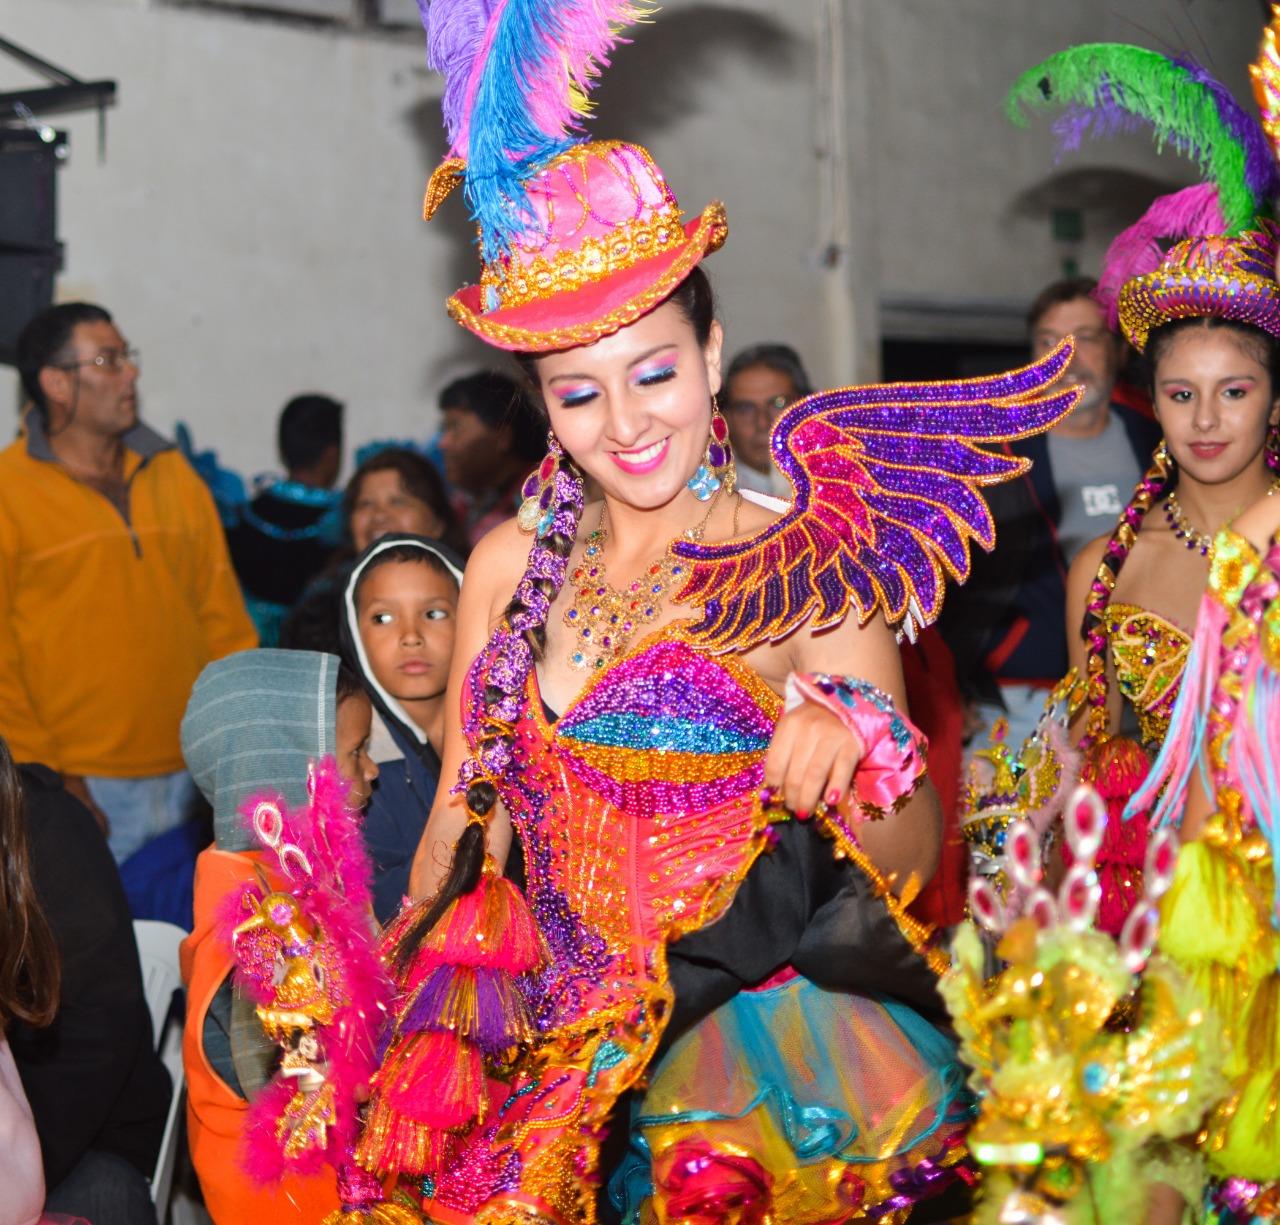 Carnavales imperdibles de la provincia de Córdoba